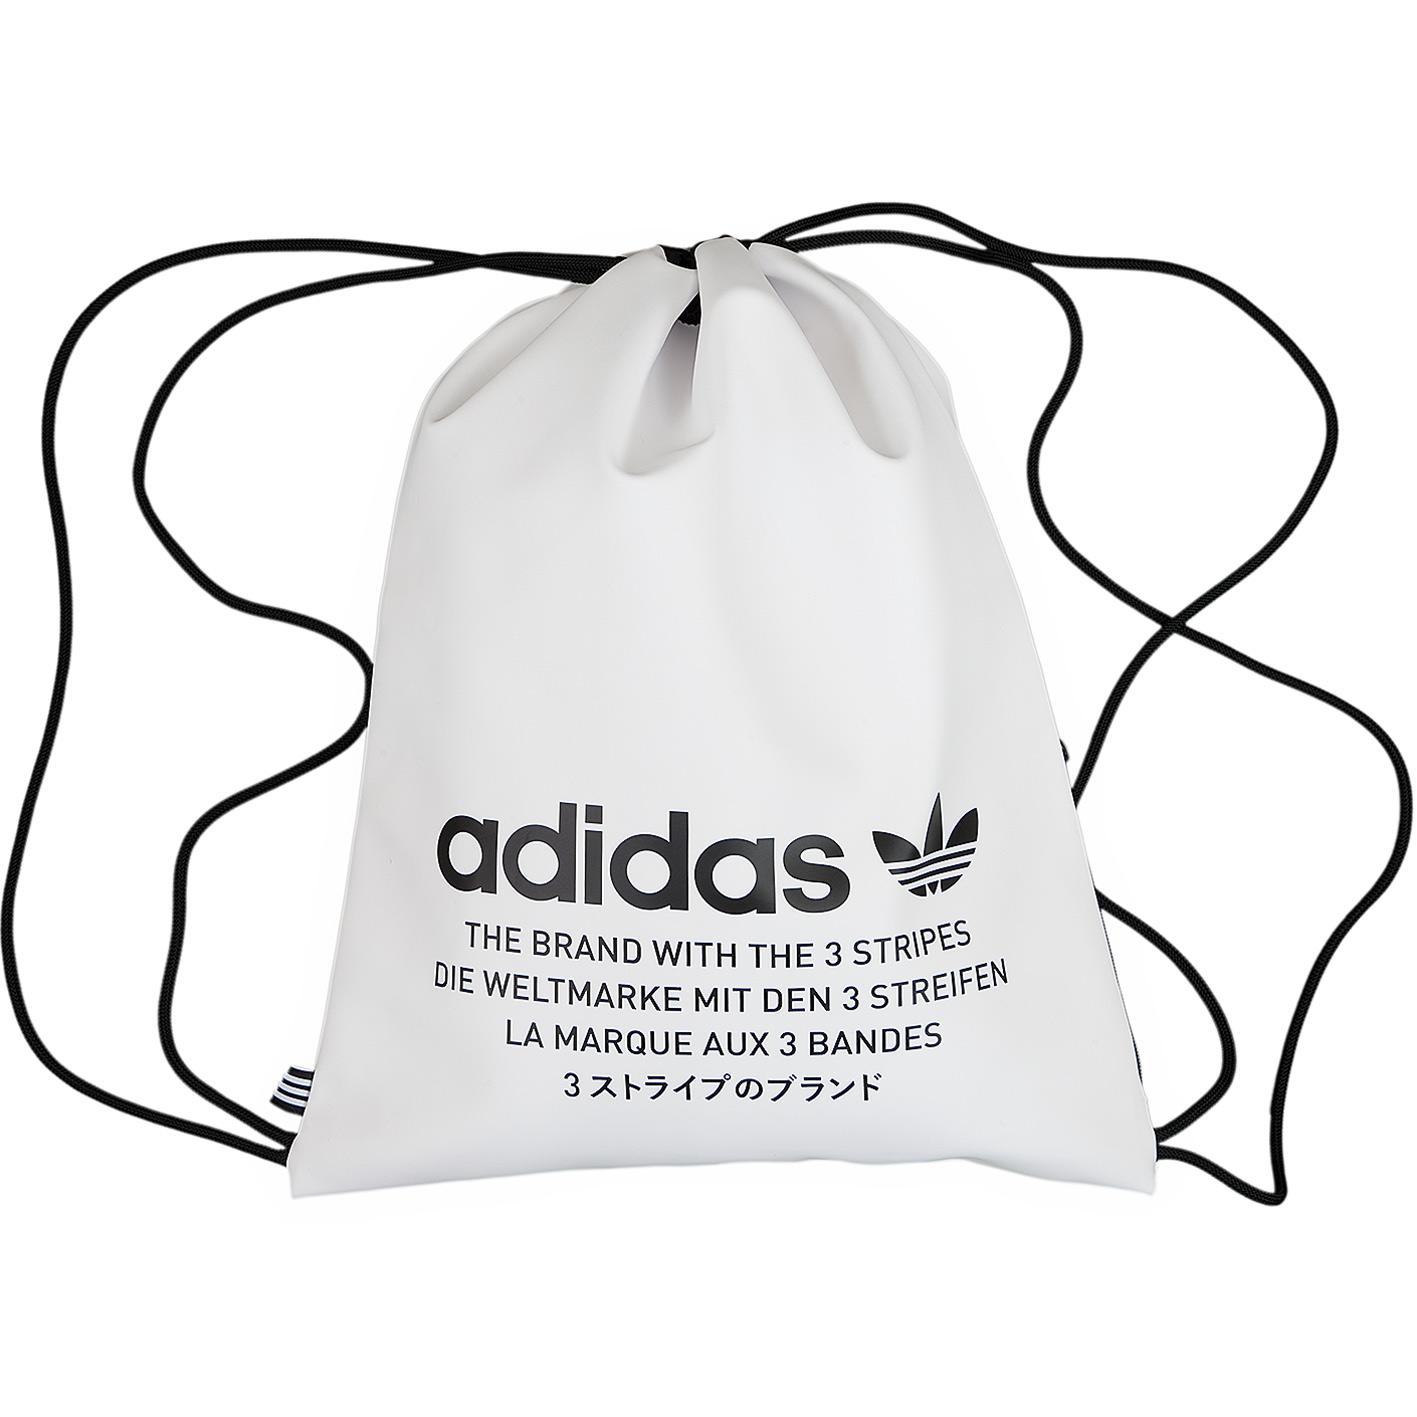 a83fc4f89d ☆ Adidas Originals Gym Bag NMD Gymsack weiß - hier bestellen!